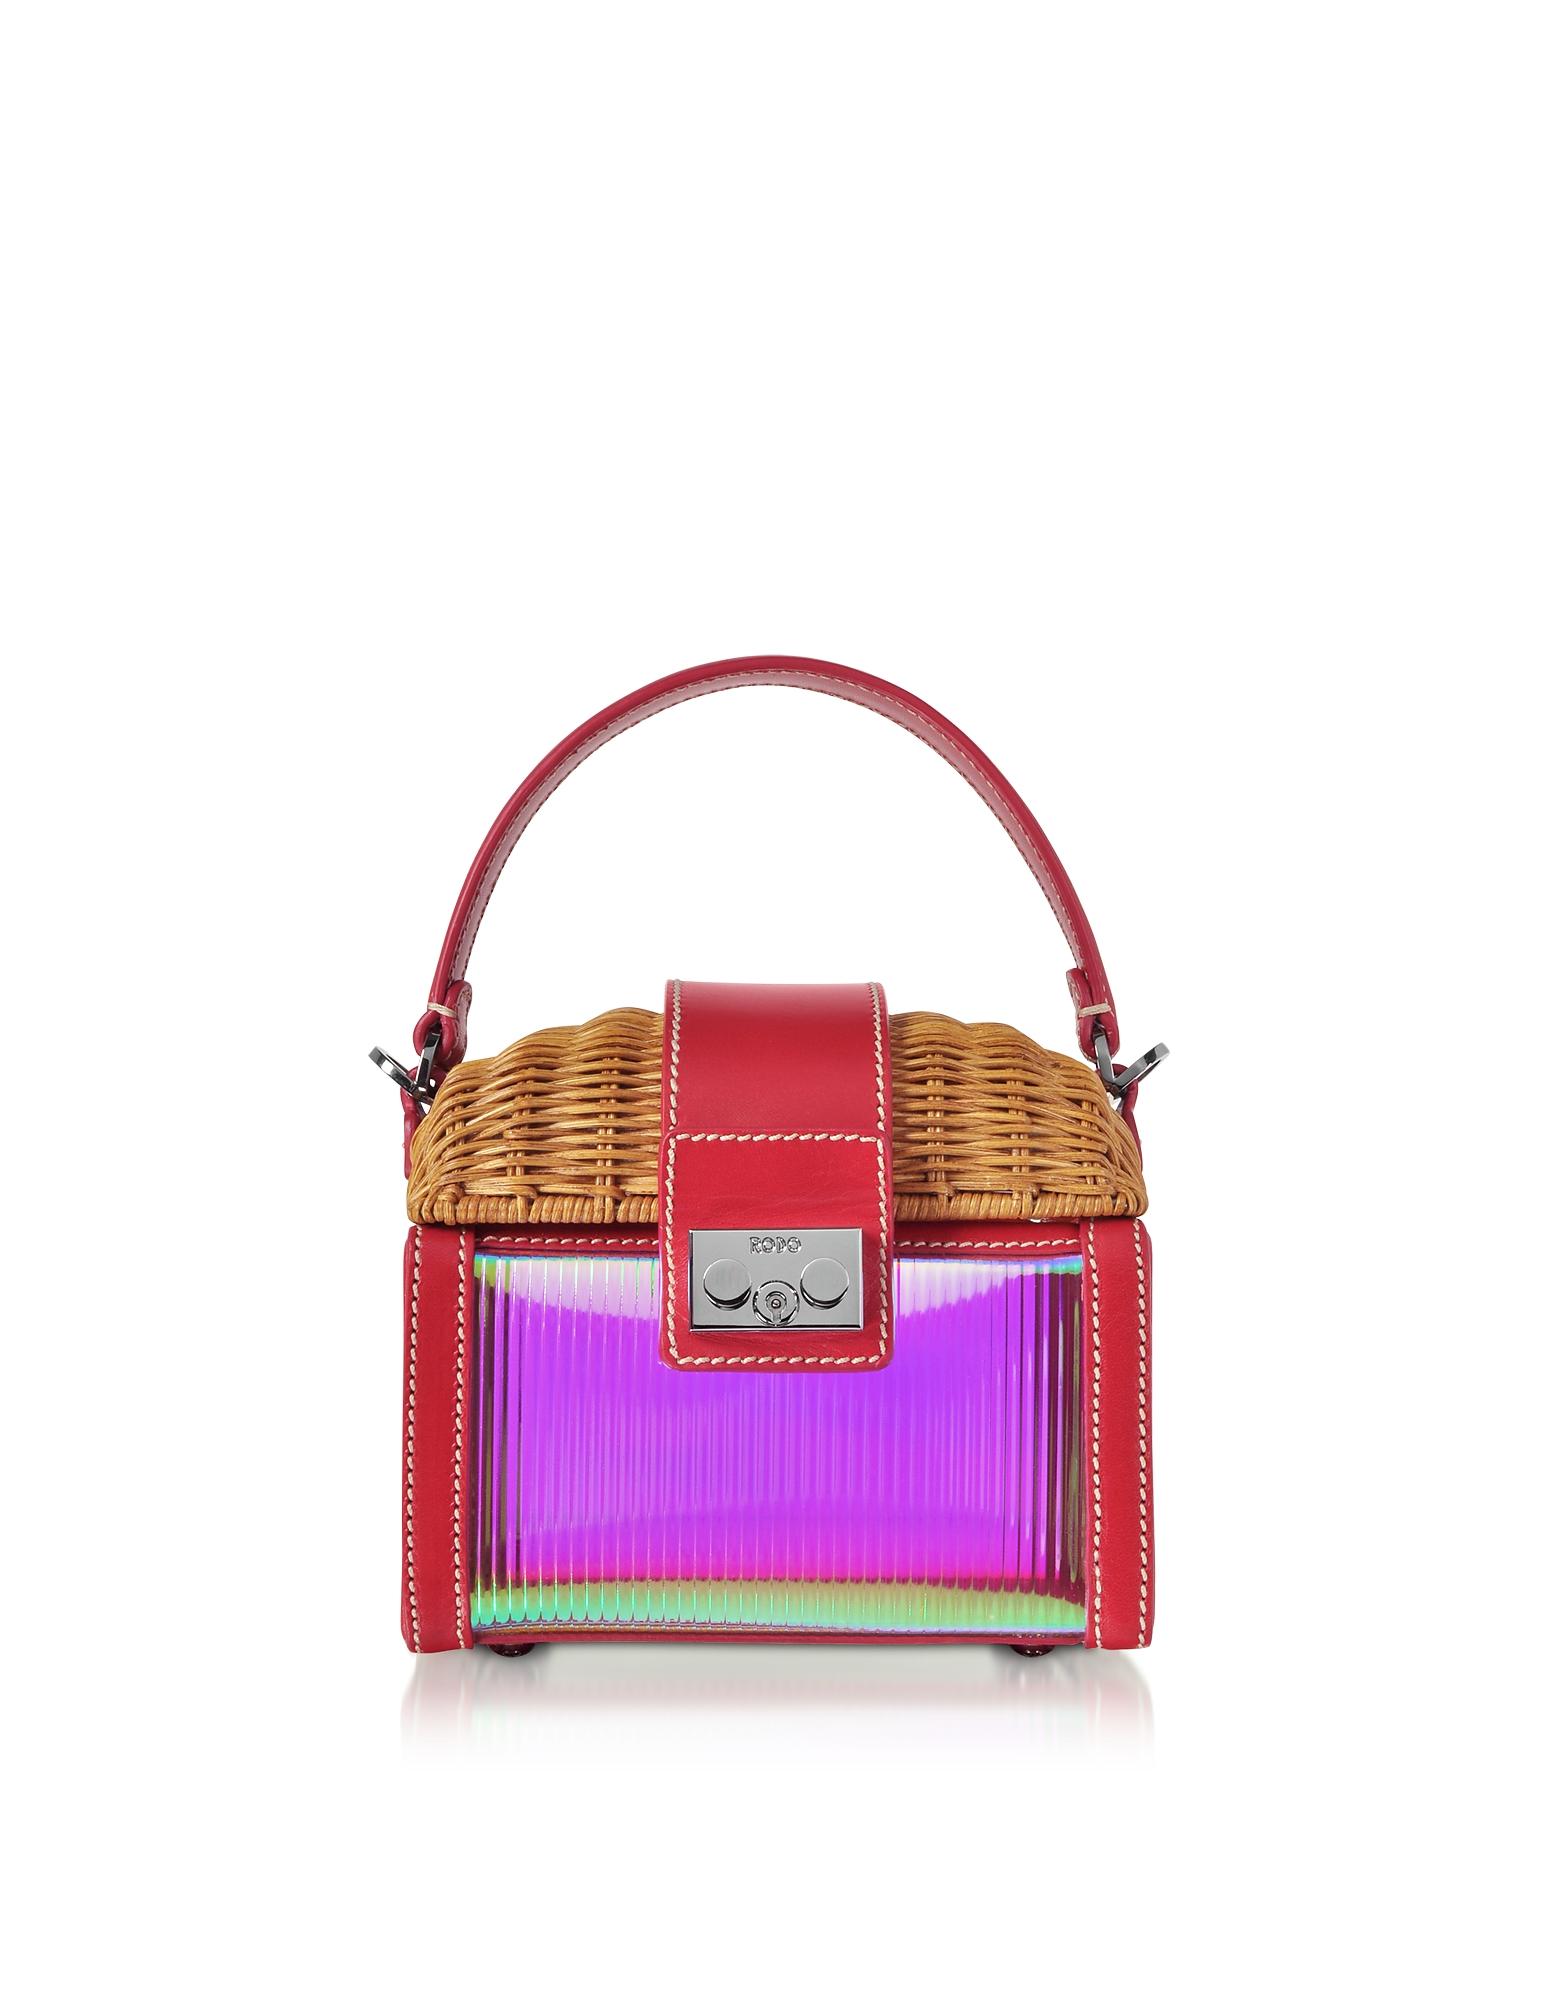 Rodo Designer Handbags, Natural Wicker and Leather Mini Bag